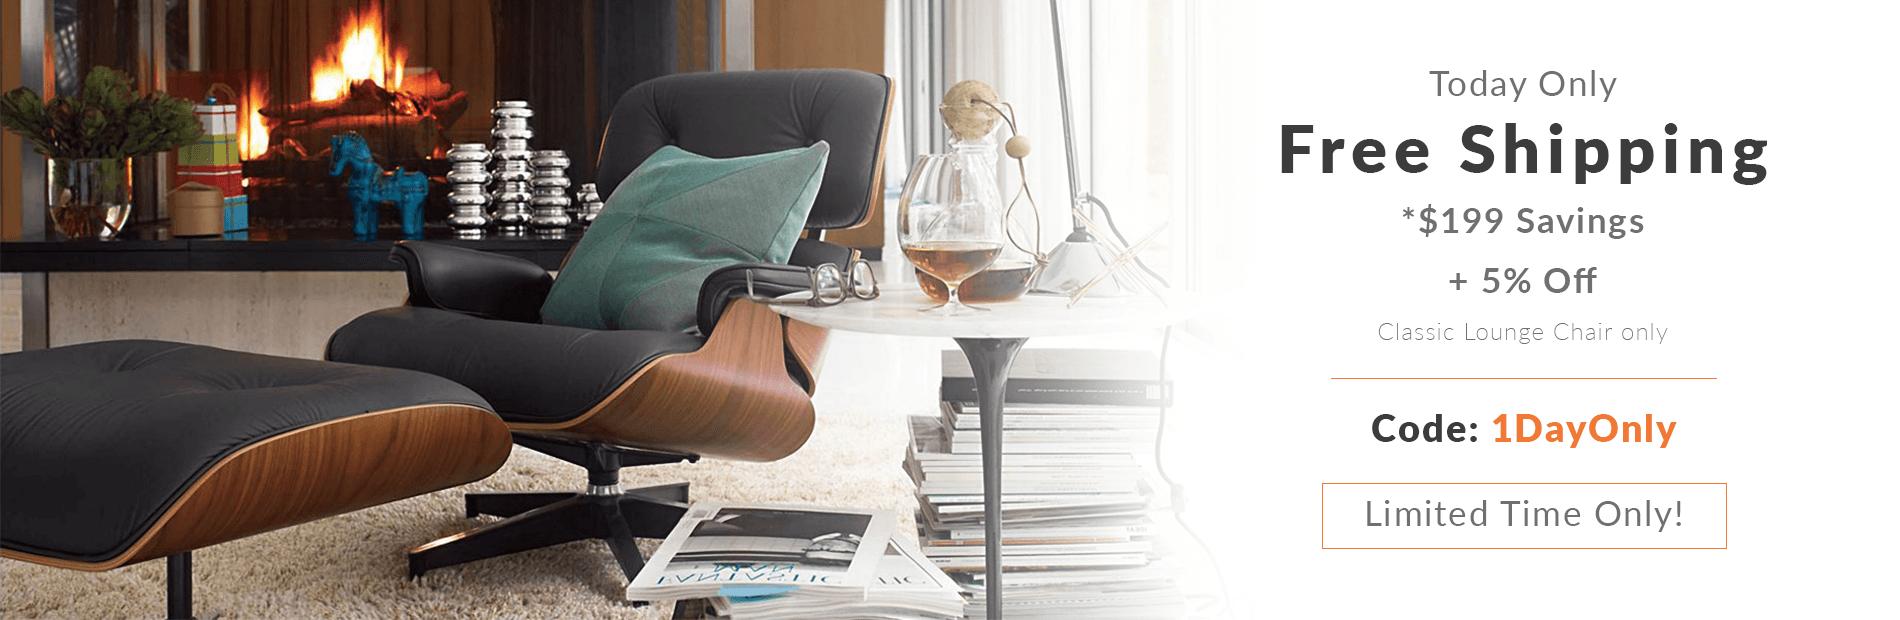 Manhattan Home Design Modern Home Furniture Office Furniture